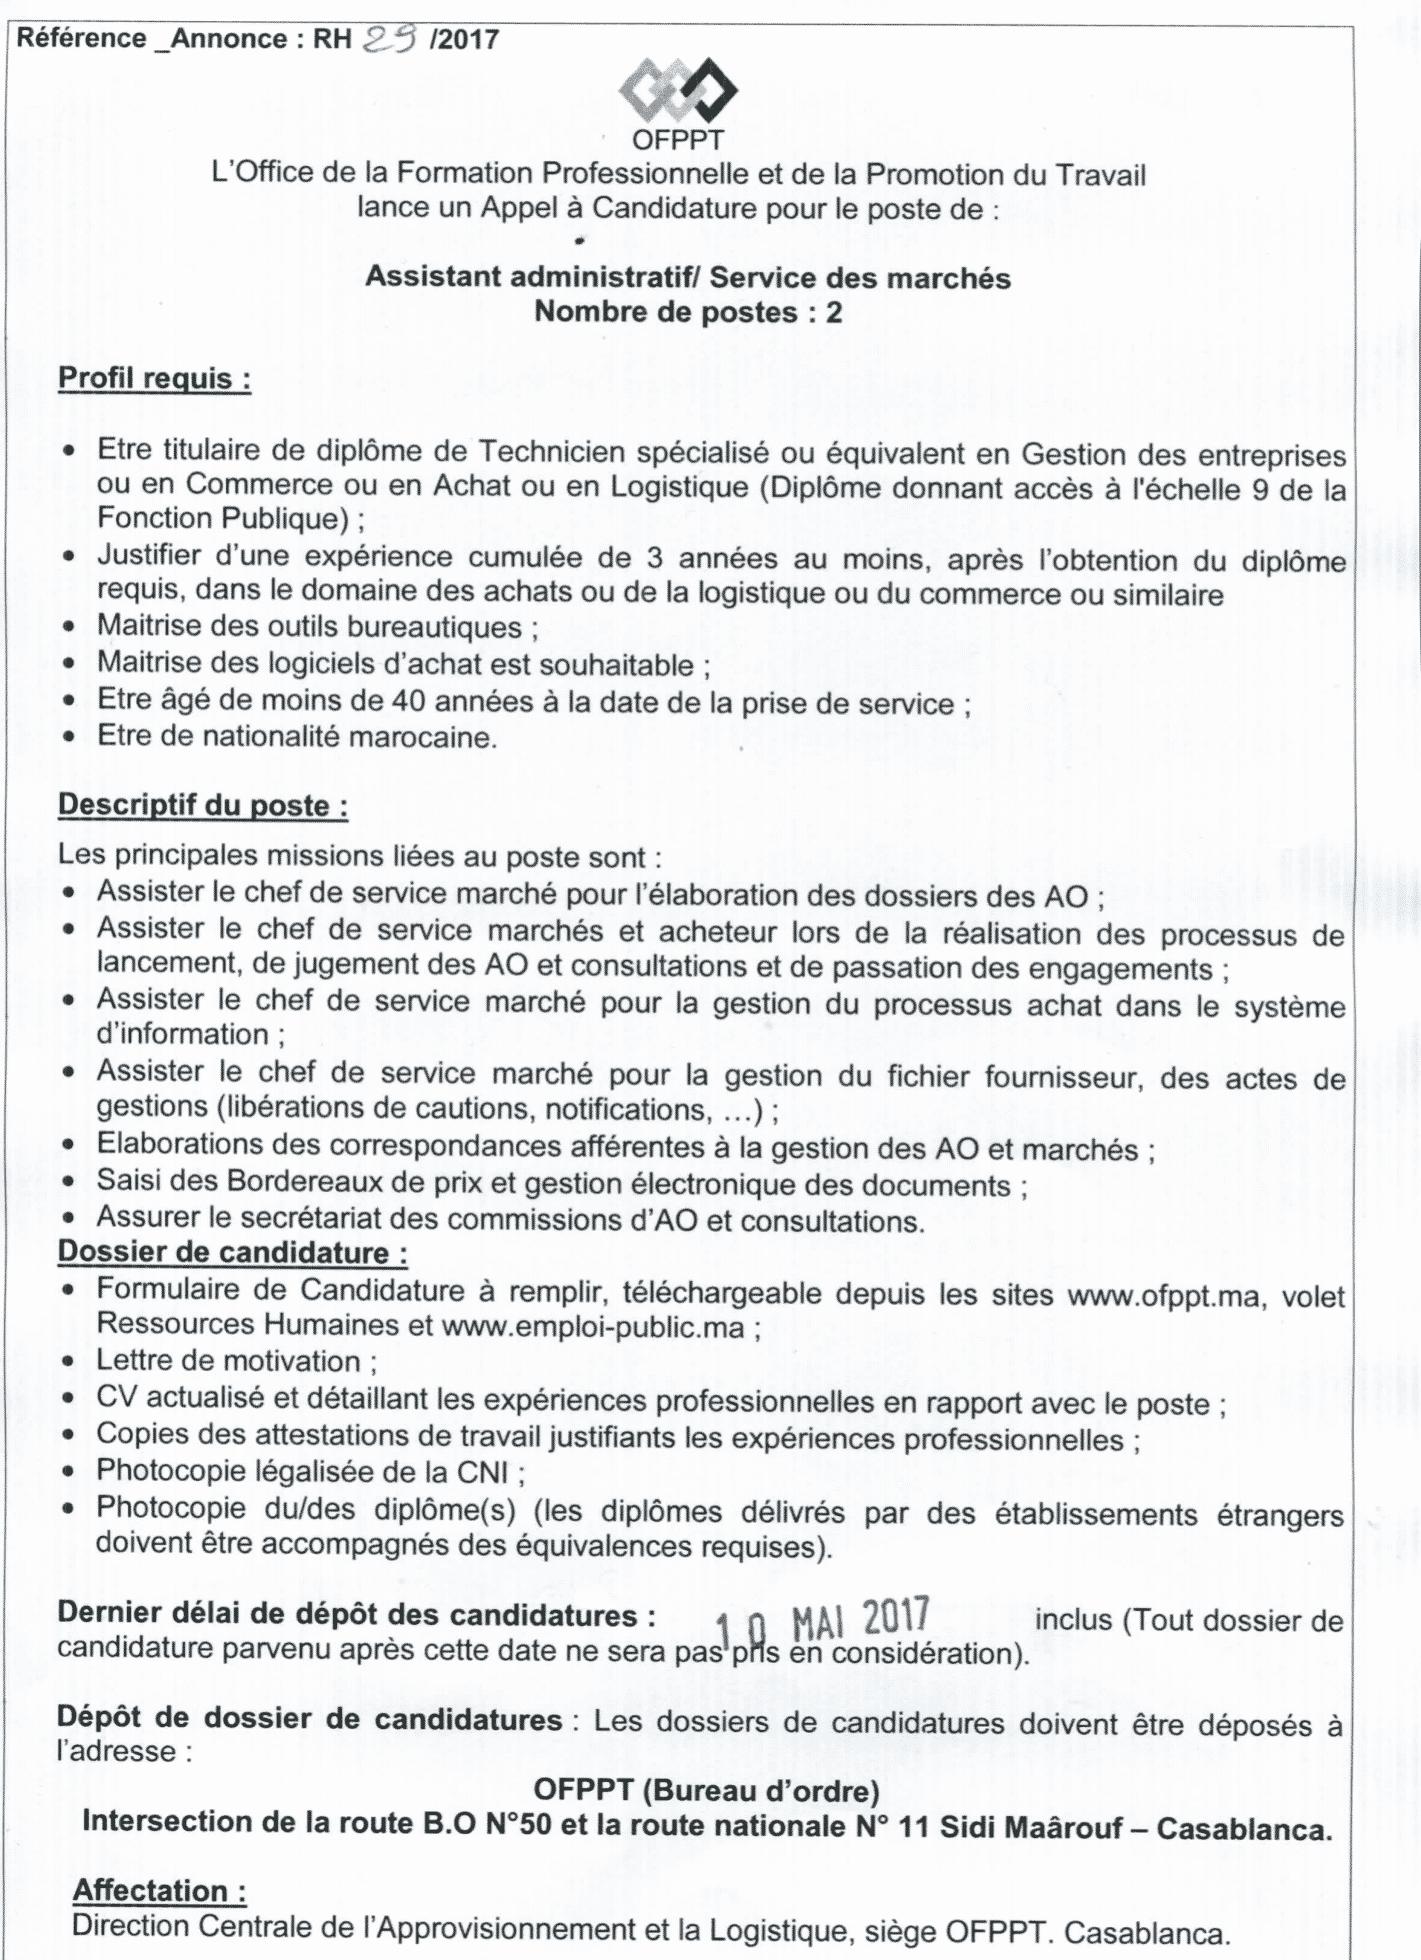 ofppt recrute 2 assistants administratifs  casablanca